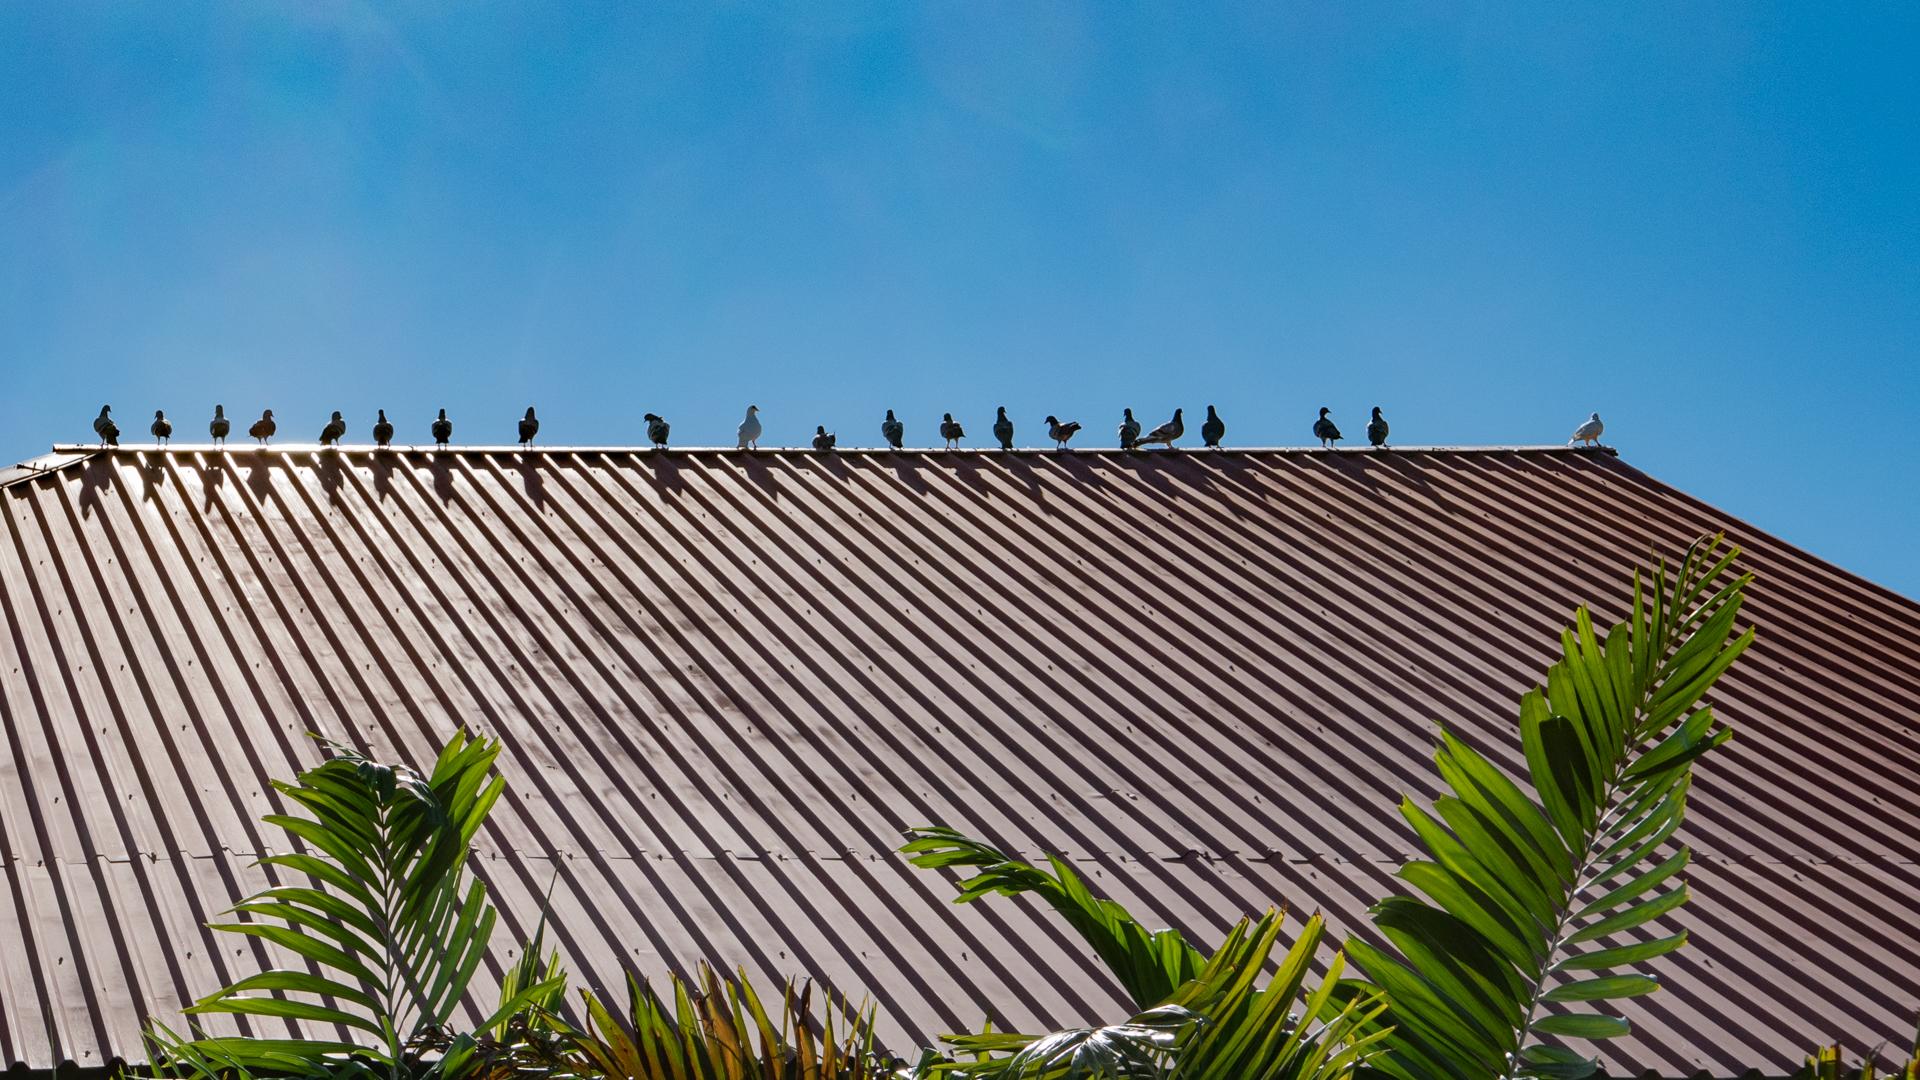 cabo-san-lucas-birds-rooftop.jpg